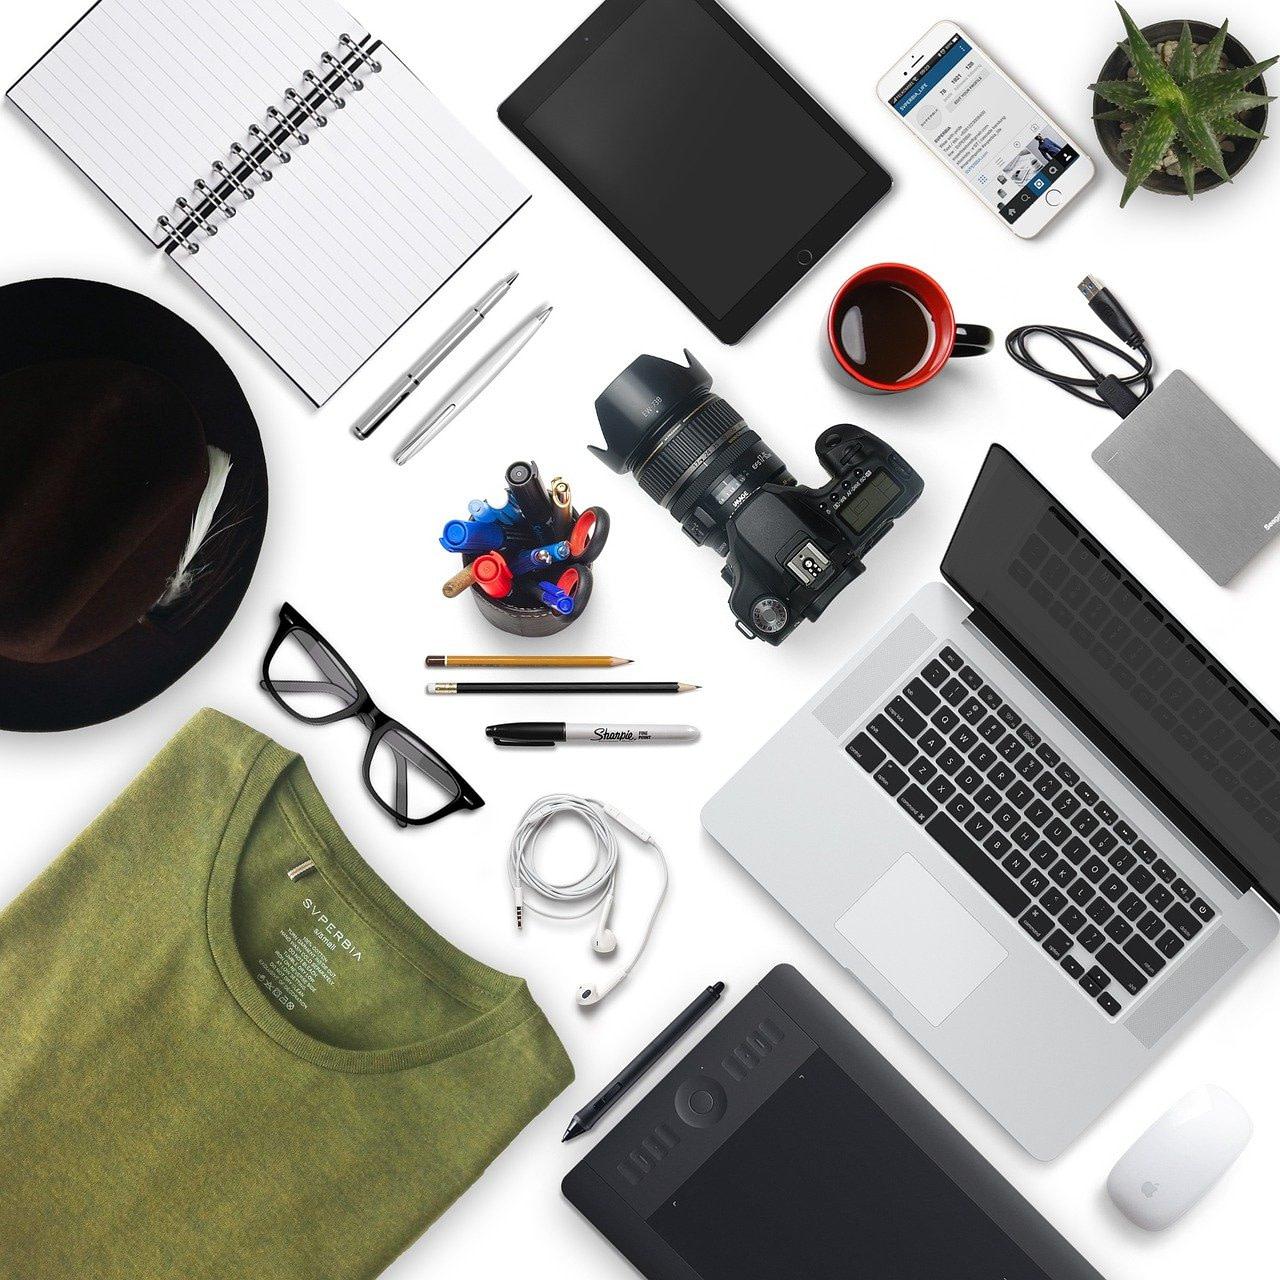 camera, iphone, macbook pro